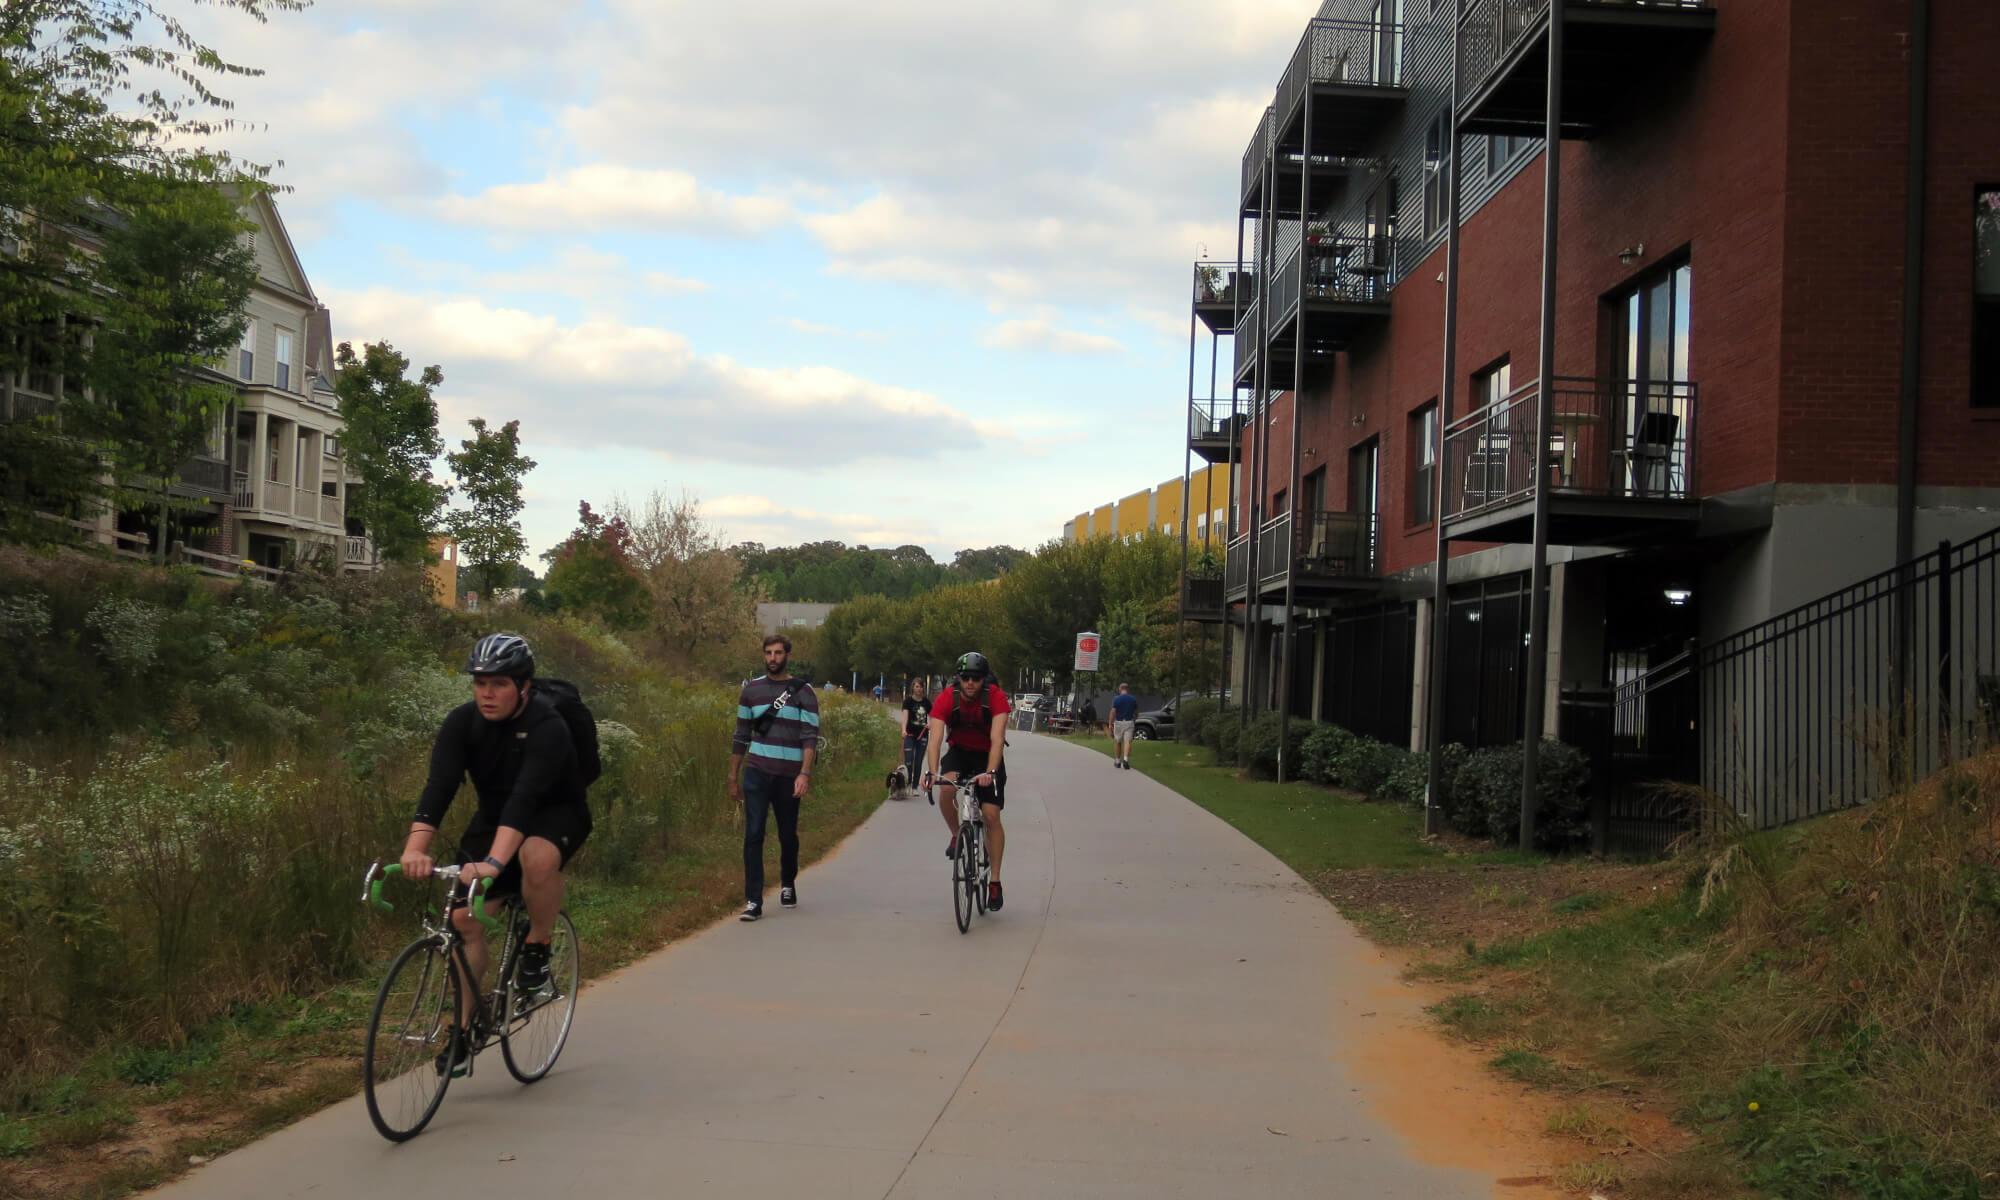 Cyclists in Atlanta, Georgia